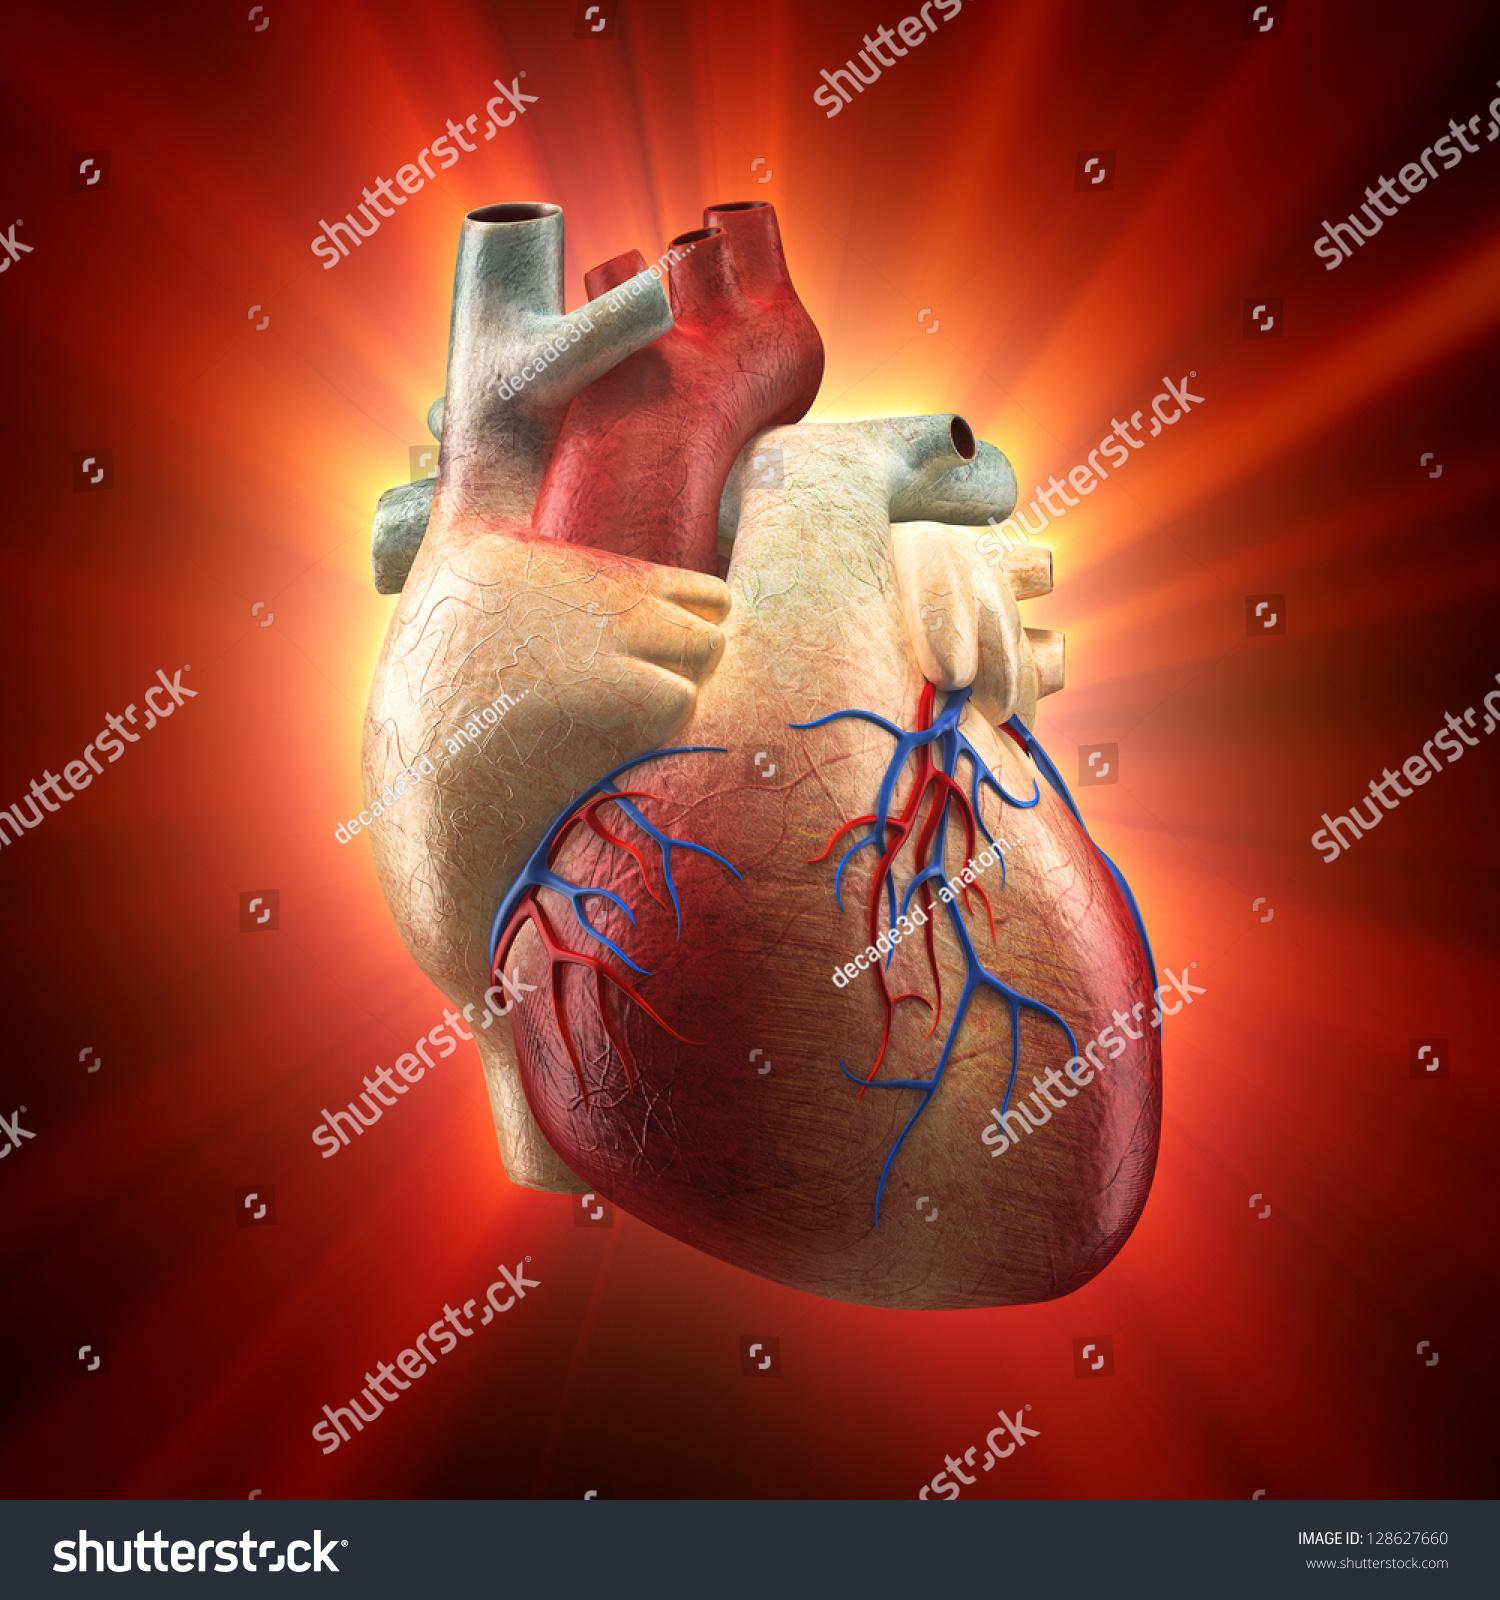 Royalty Free Stock Illustration Of Real Heart Shinning Light Human